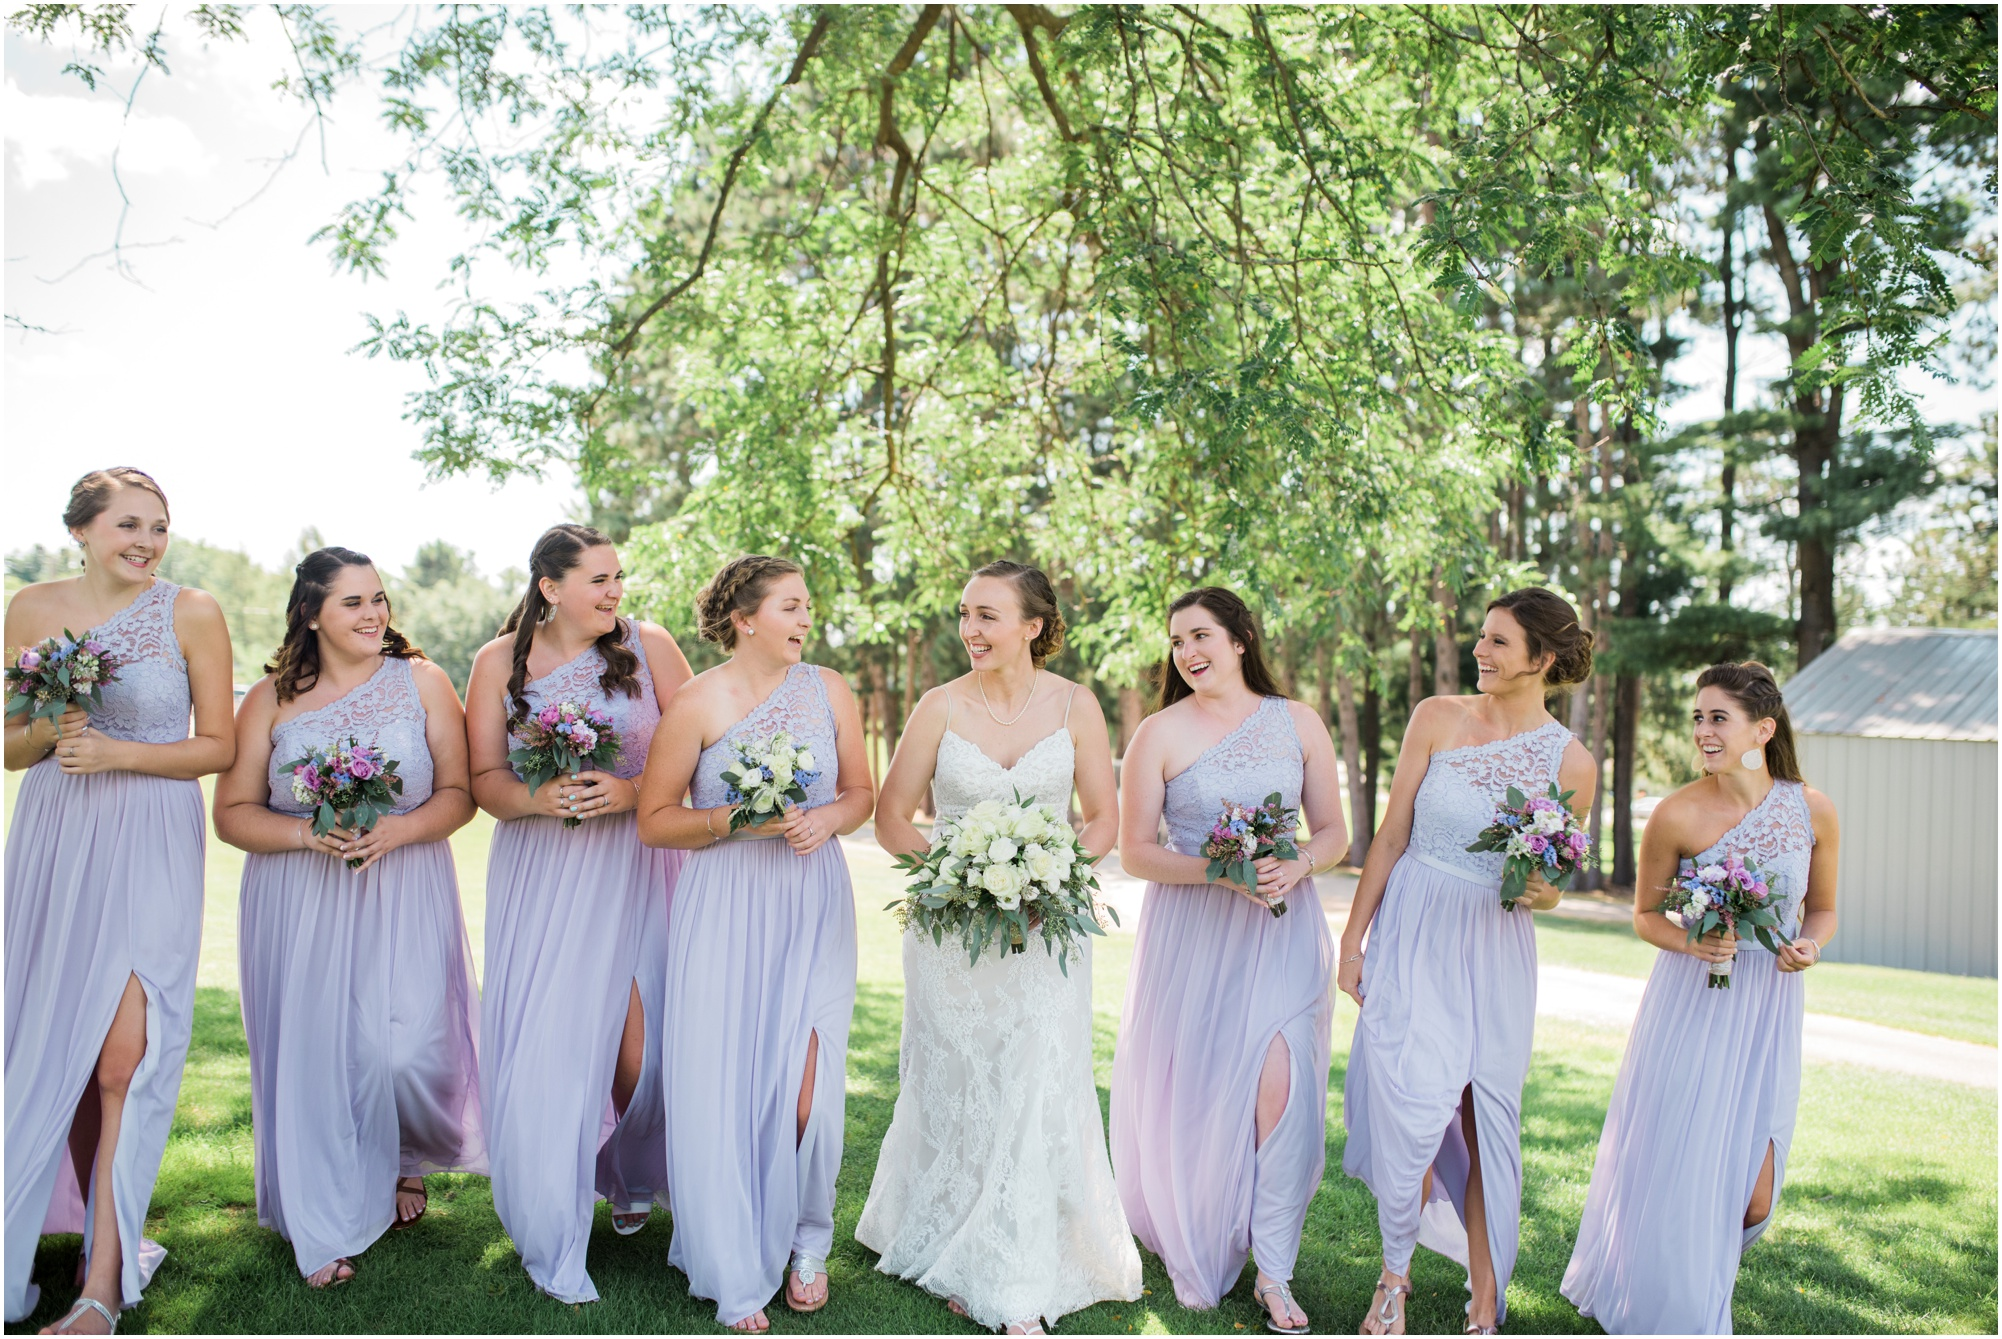 Wisconsin-Wedding-Photographer-Reedsburg-Country-Club-Kaela-and Matt-Wedding-136.jpg